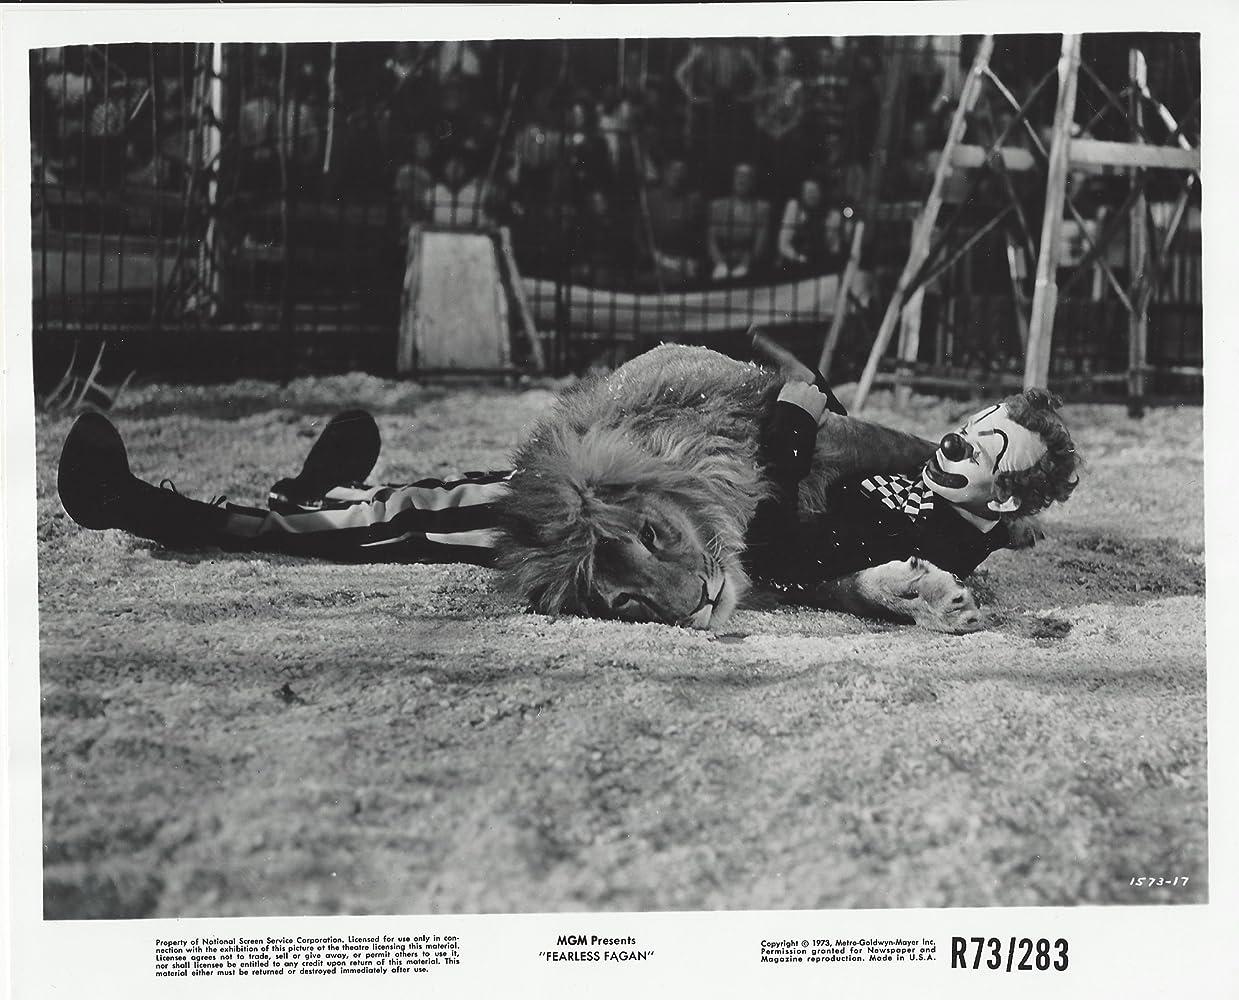 Fearless Fagan 1952